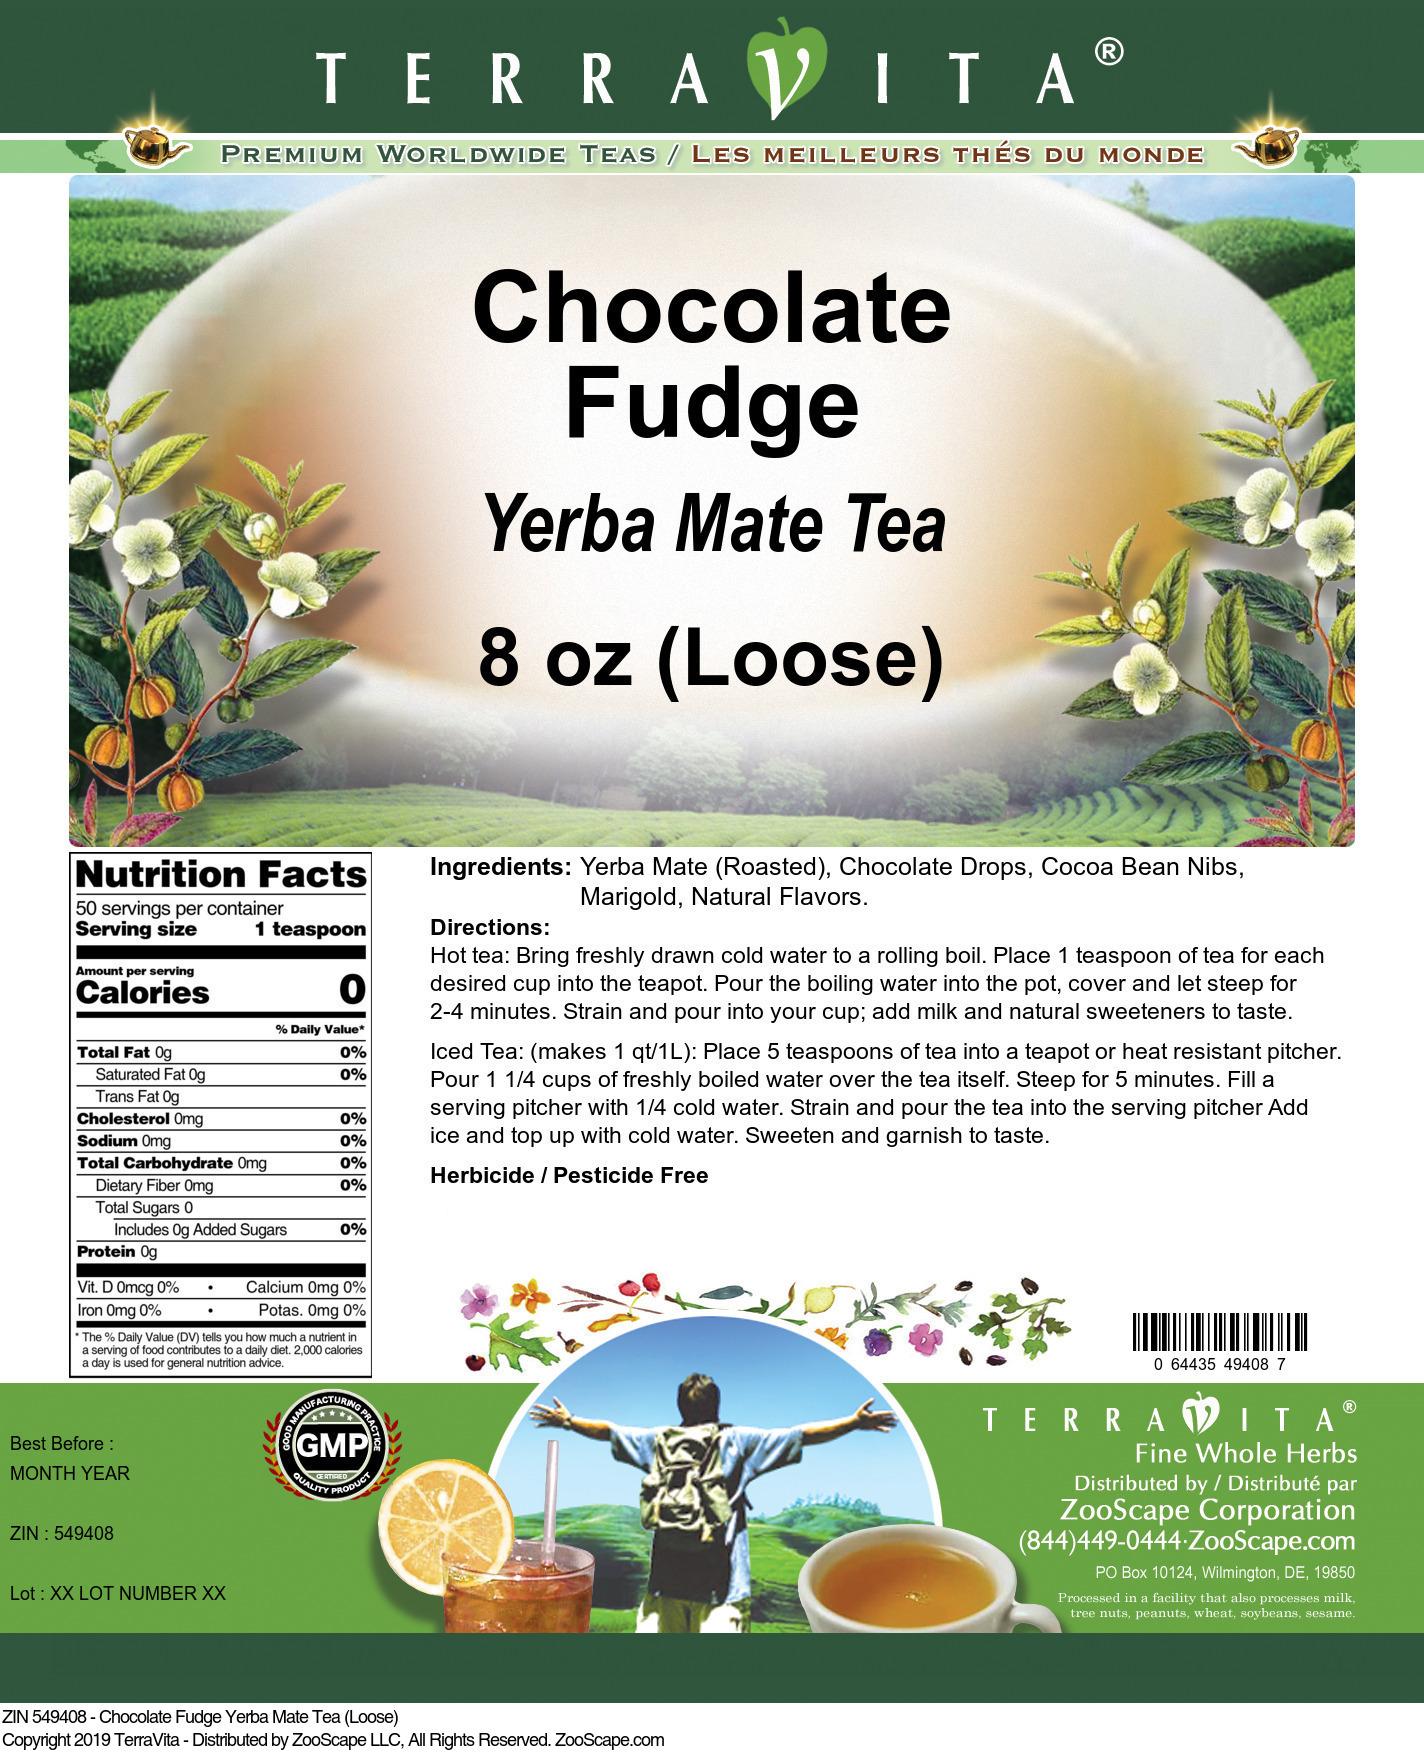 Chocolate Fudge Yerba Mate Tea (Loose)